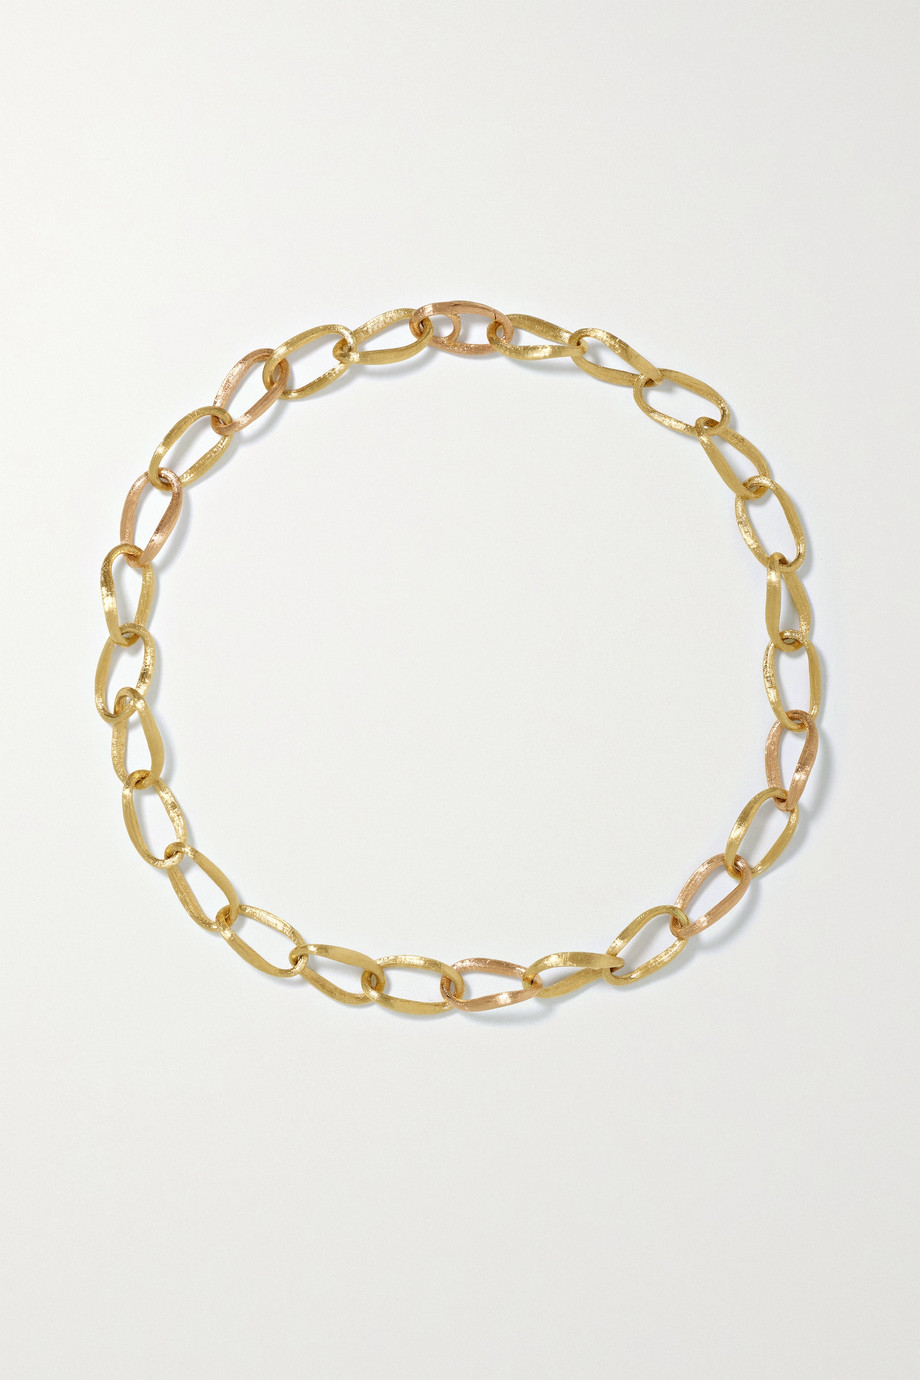 OLE LYNGGAARD COPENHAGEN Collier en or jaune et rose 18 carats (750/1000) Love Medium